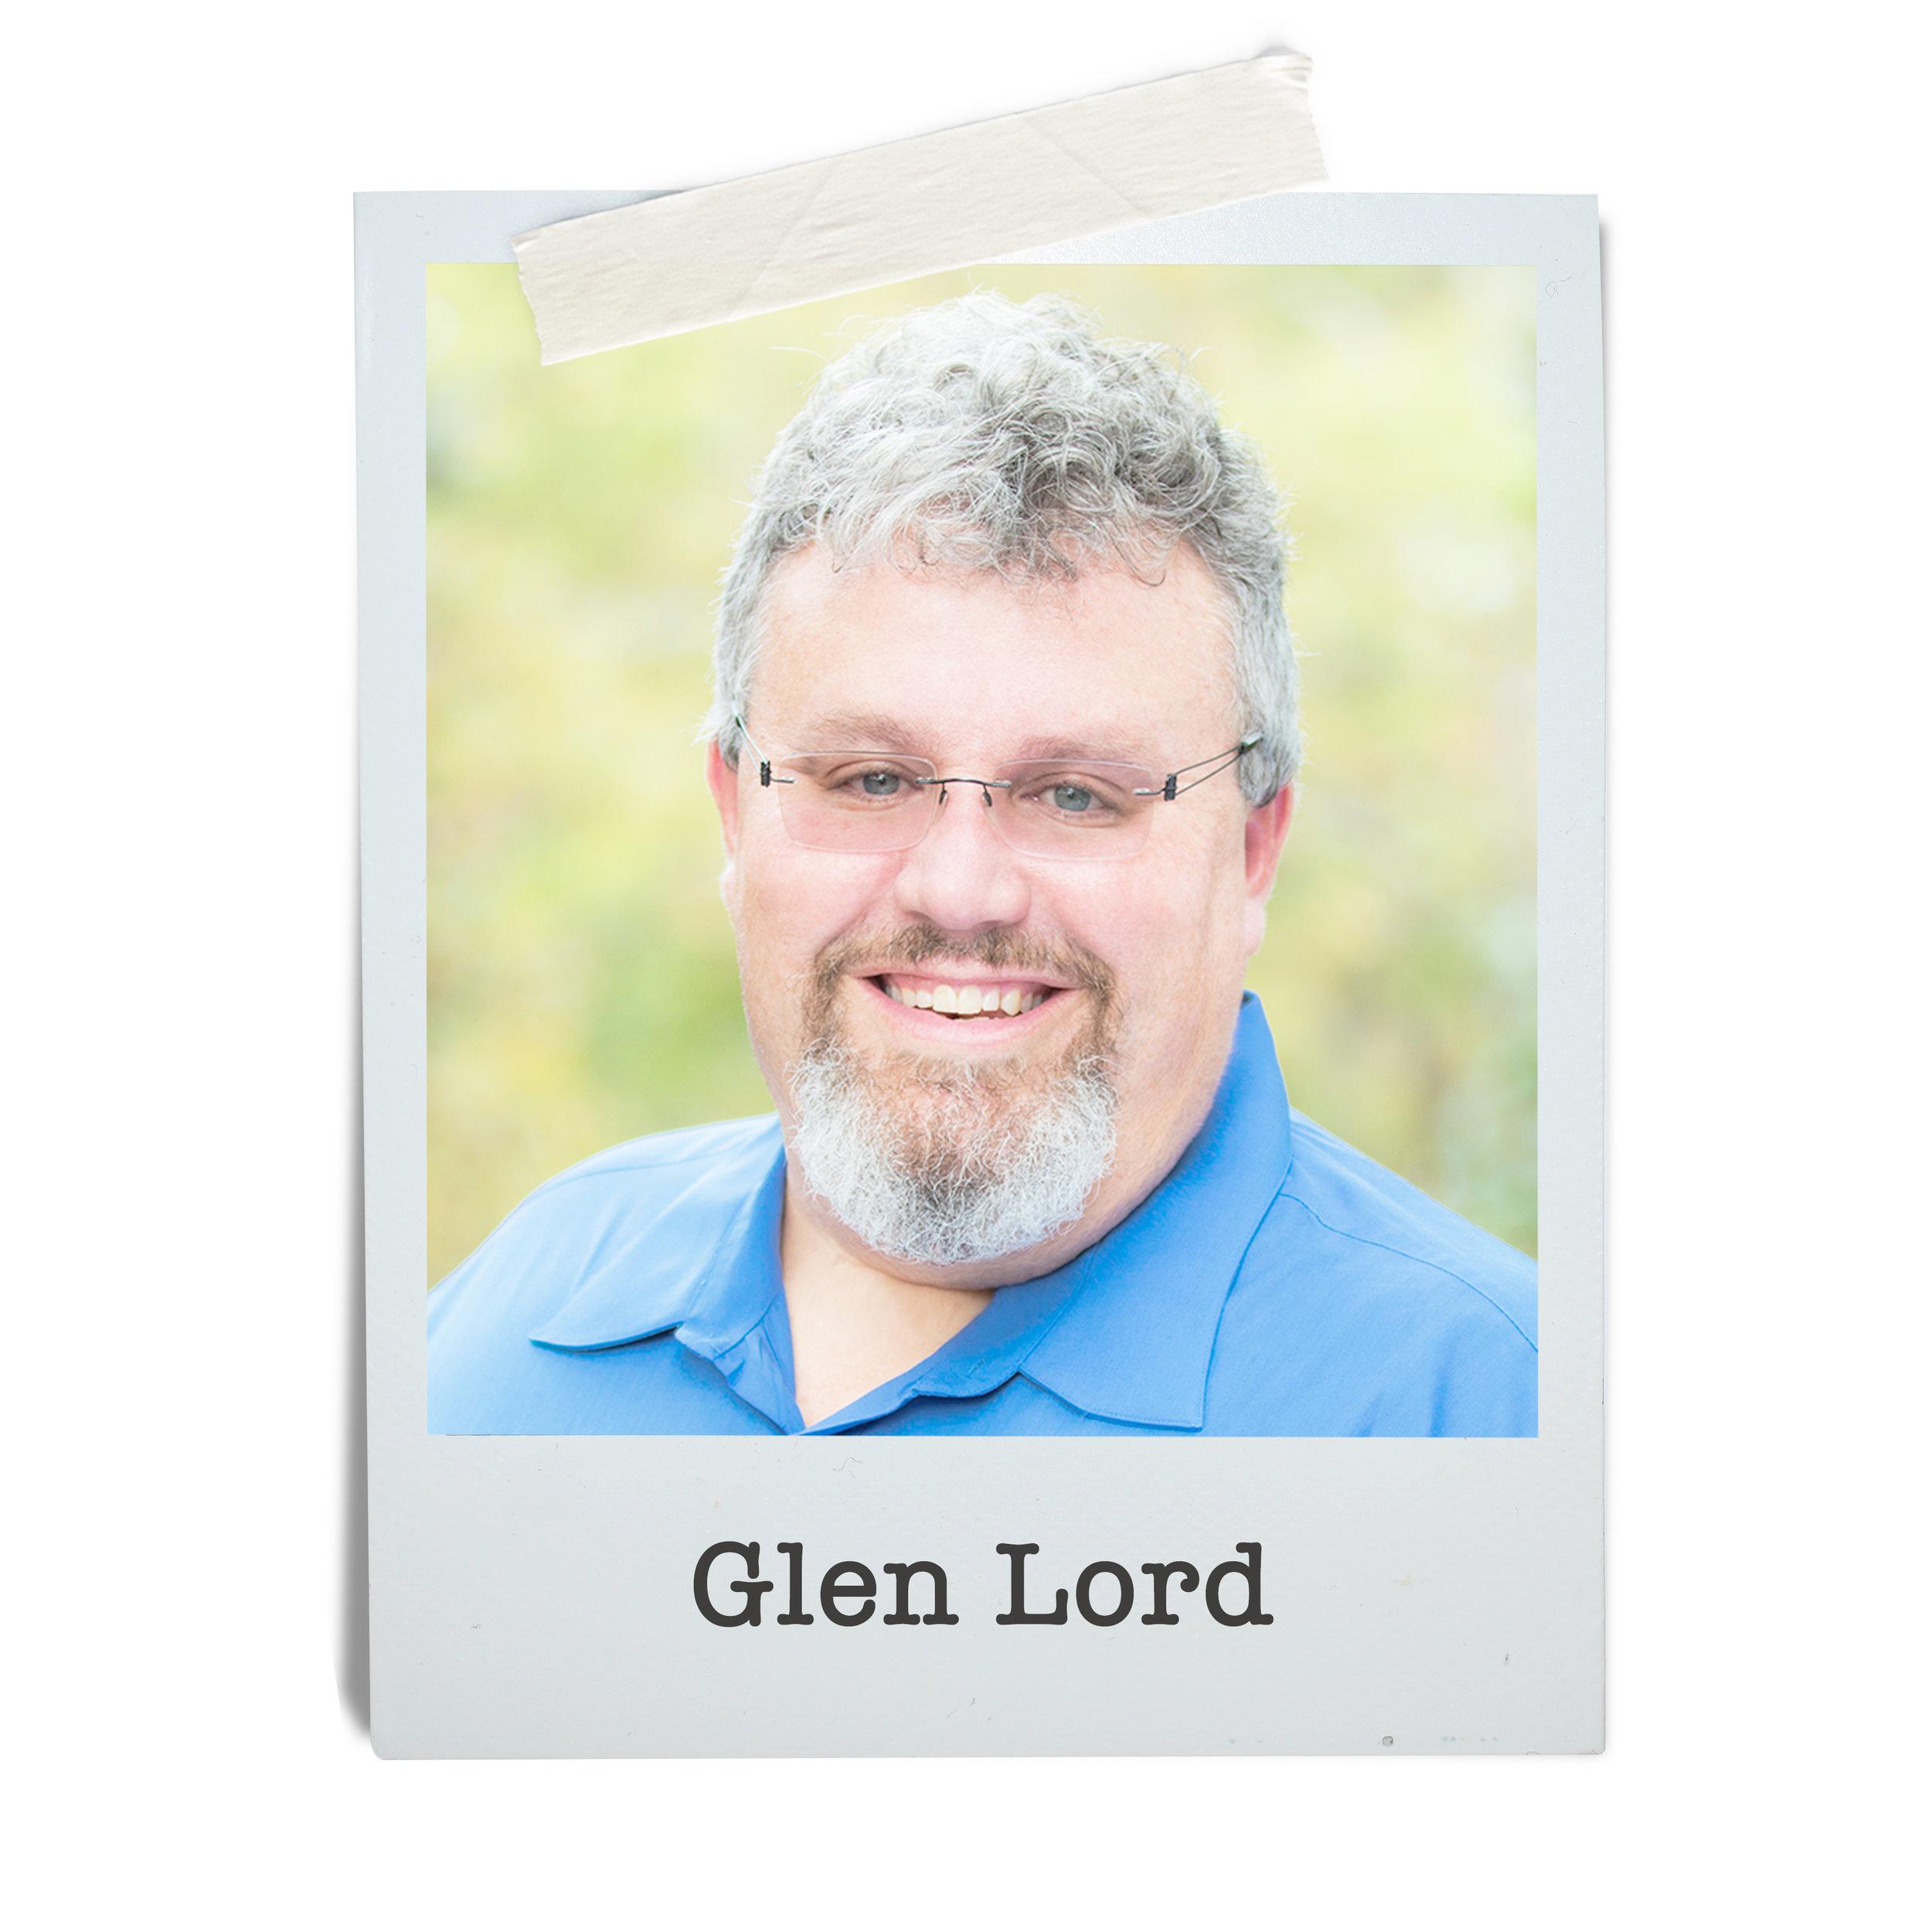 Glen Lord